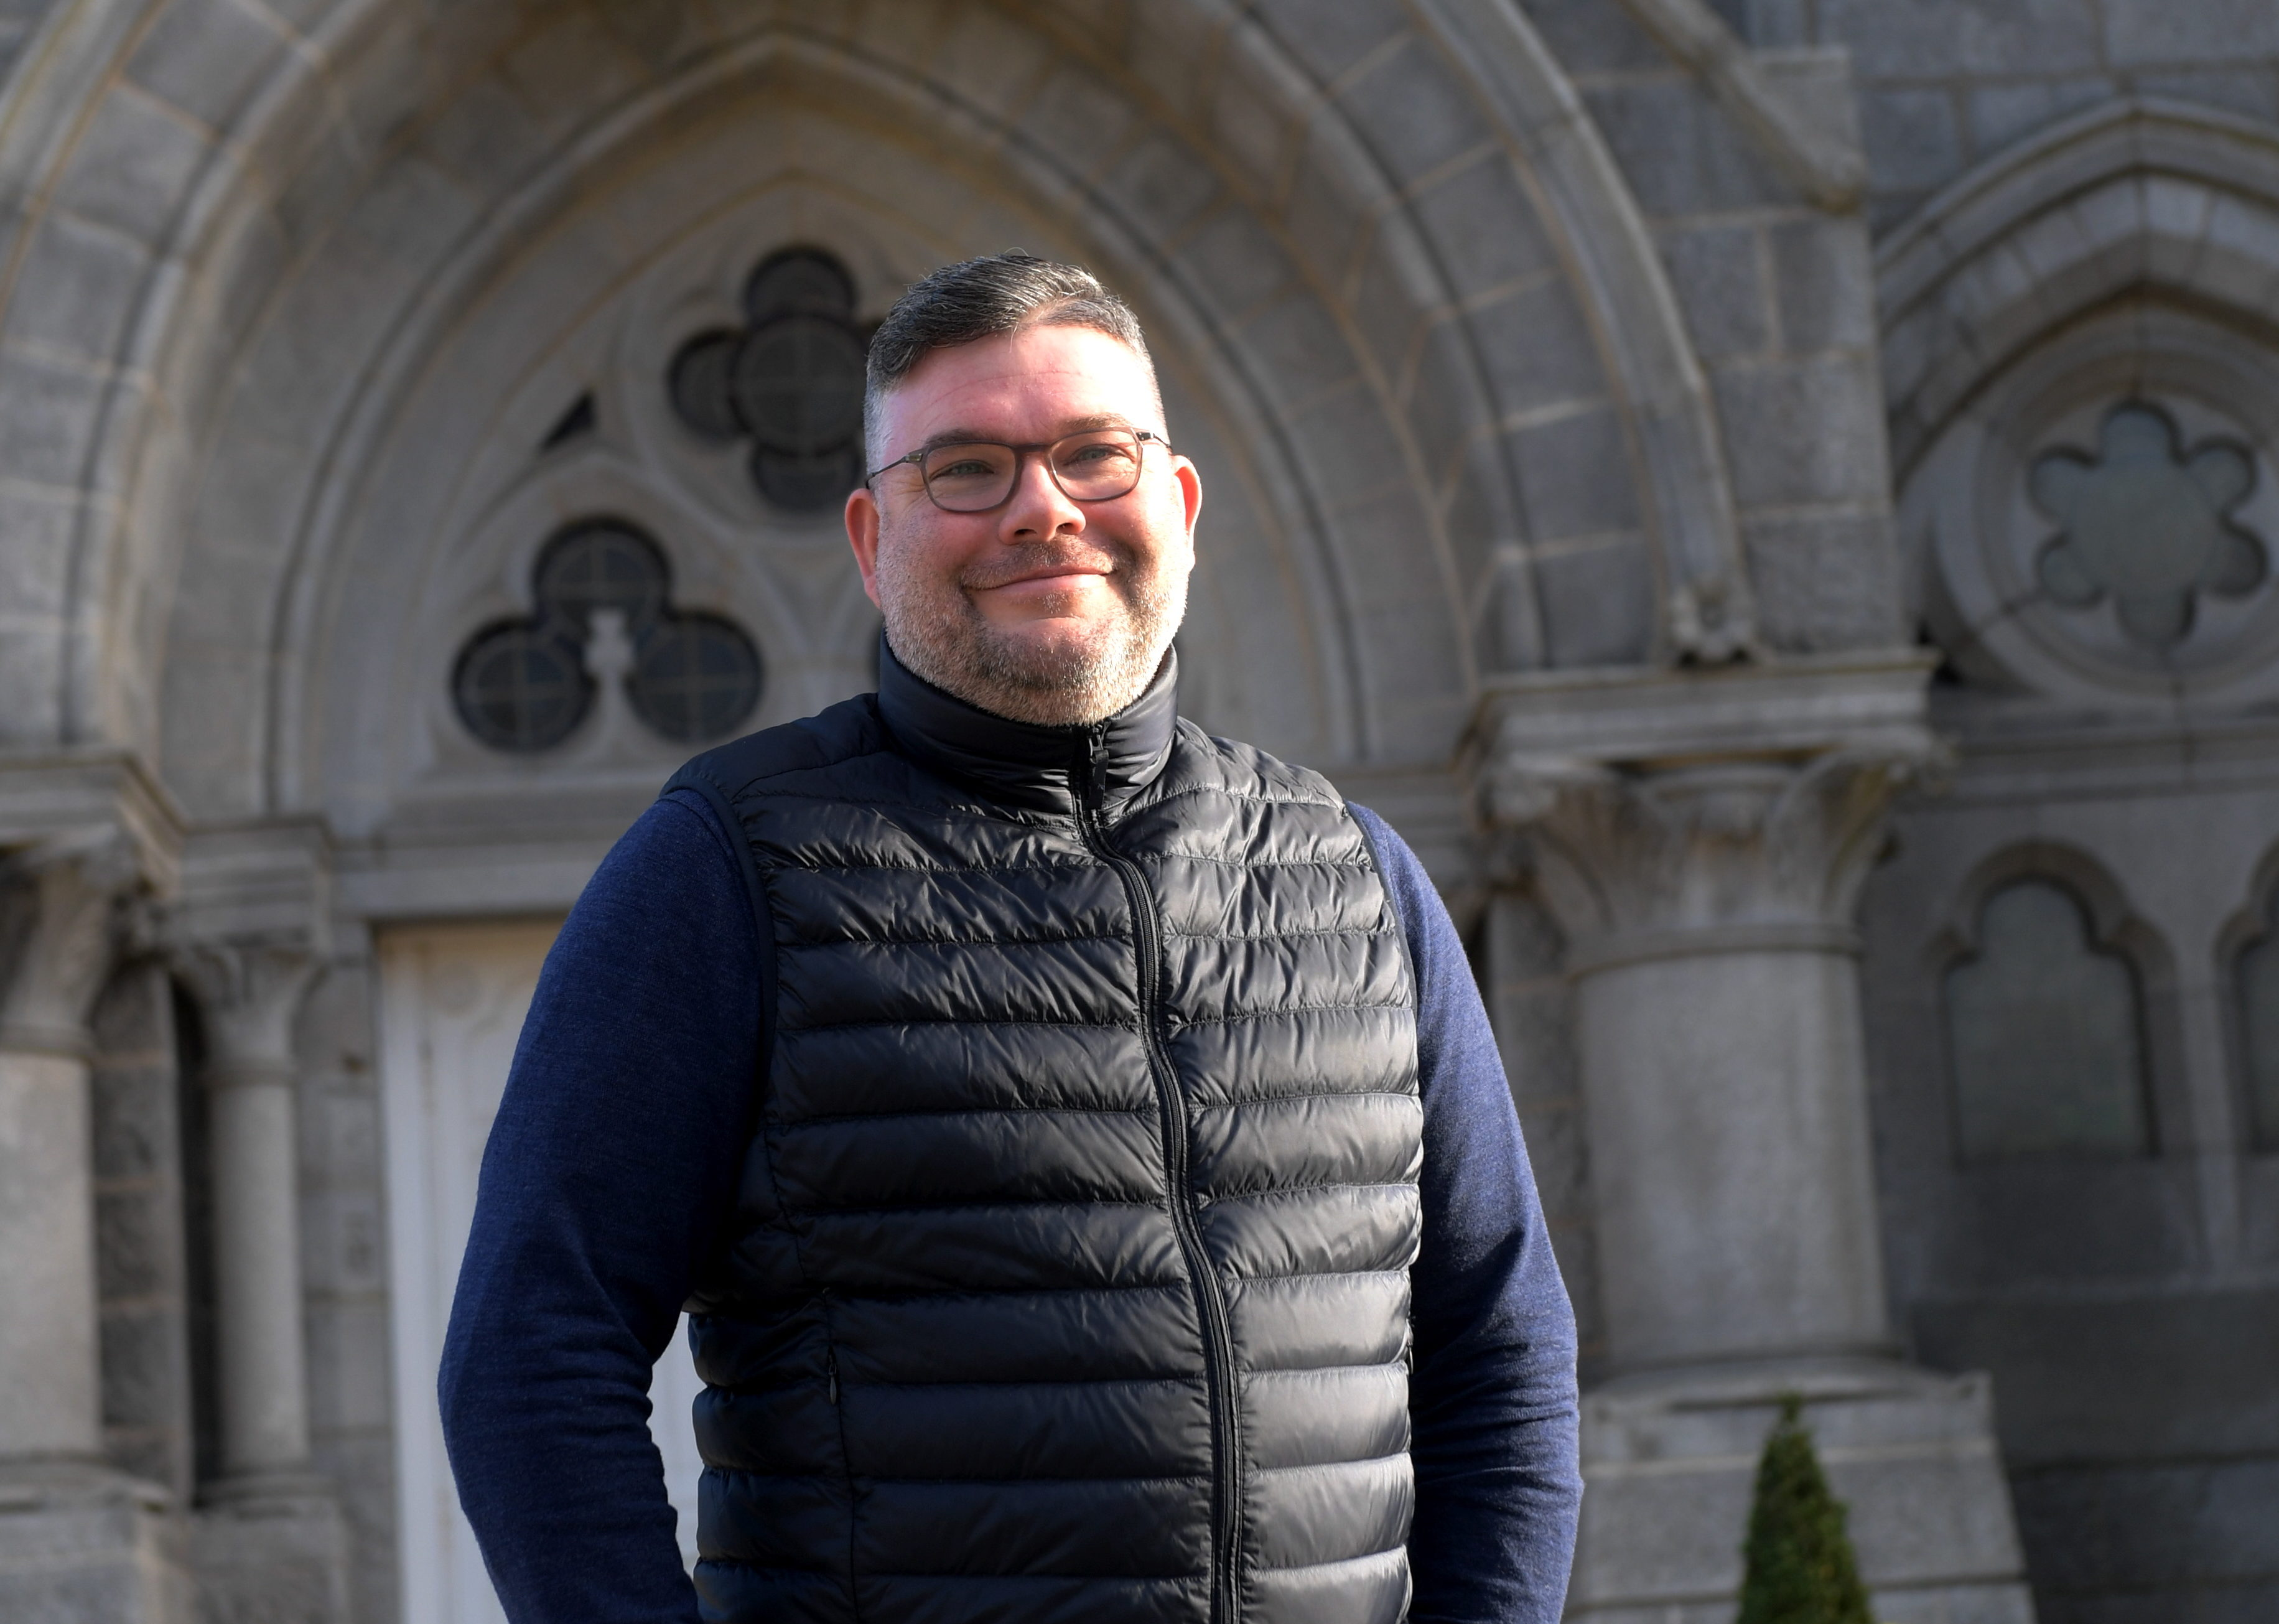 Reverend Scott Rennie has high hopes for the merger.